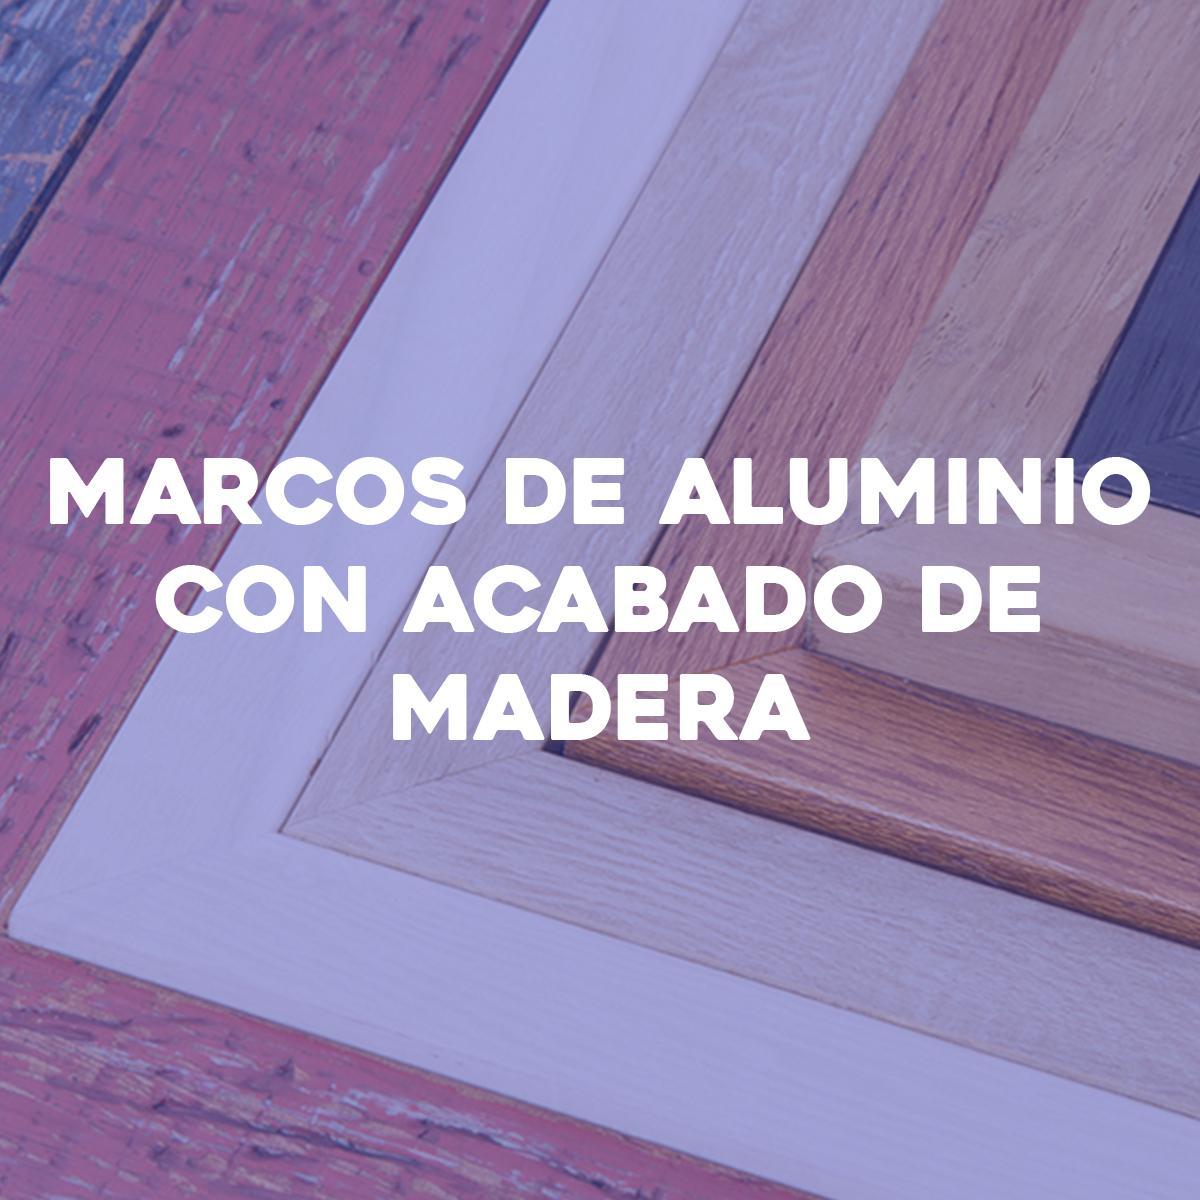 Aluminum frames with wood finish